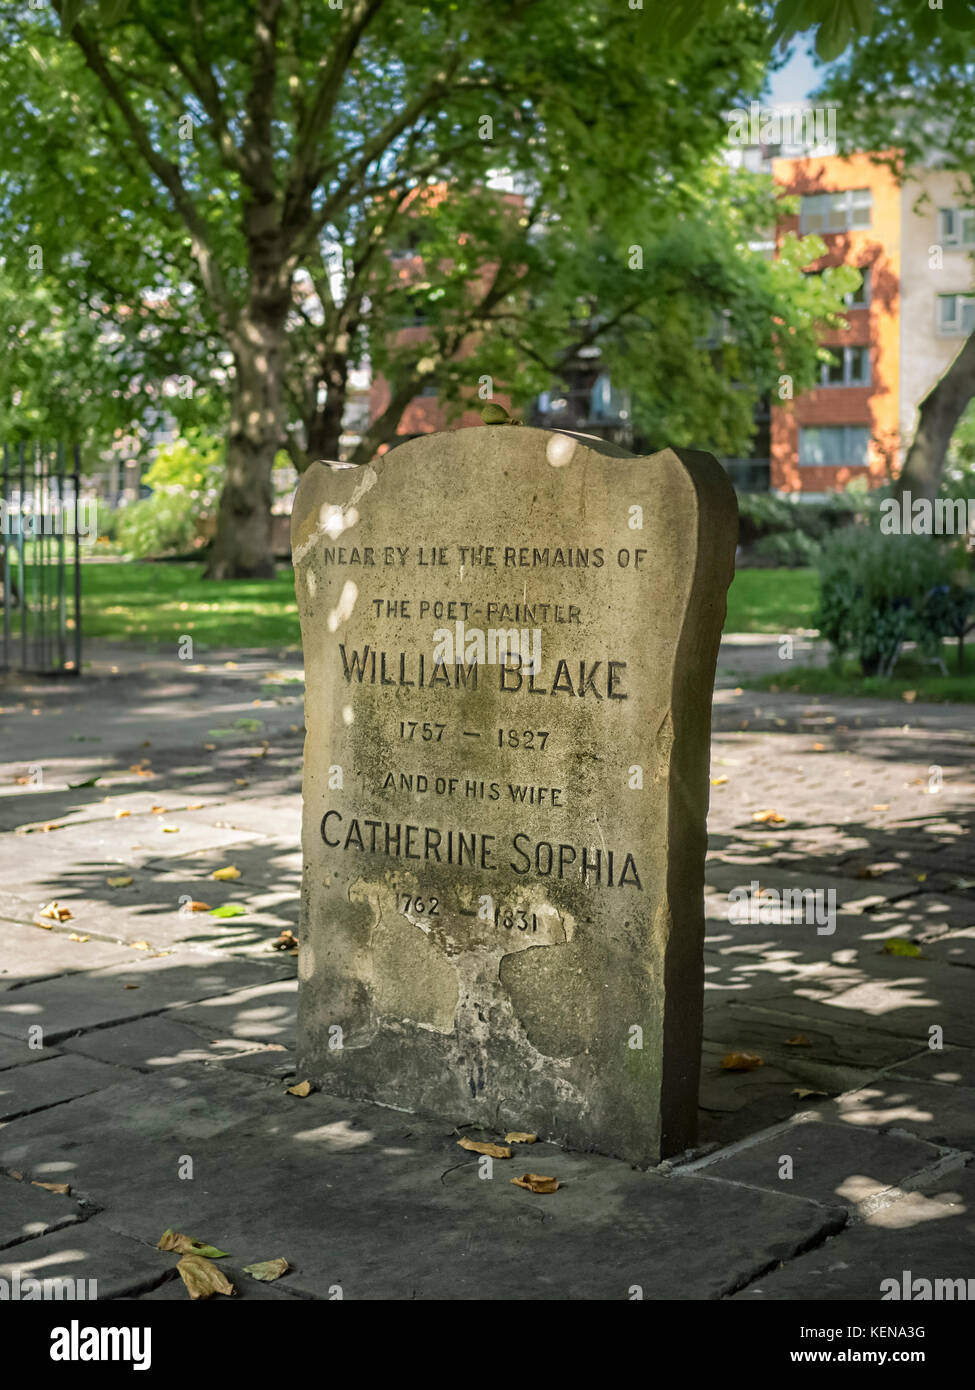 MEMORIAL GRAVE FOR WILLIAM BLAKE, LONDON:  Headstone for Poet William Blake in Bunhill Fields Burial Ground, London Stock Photo